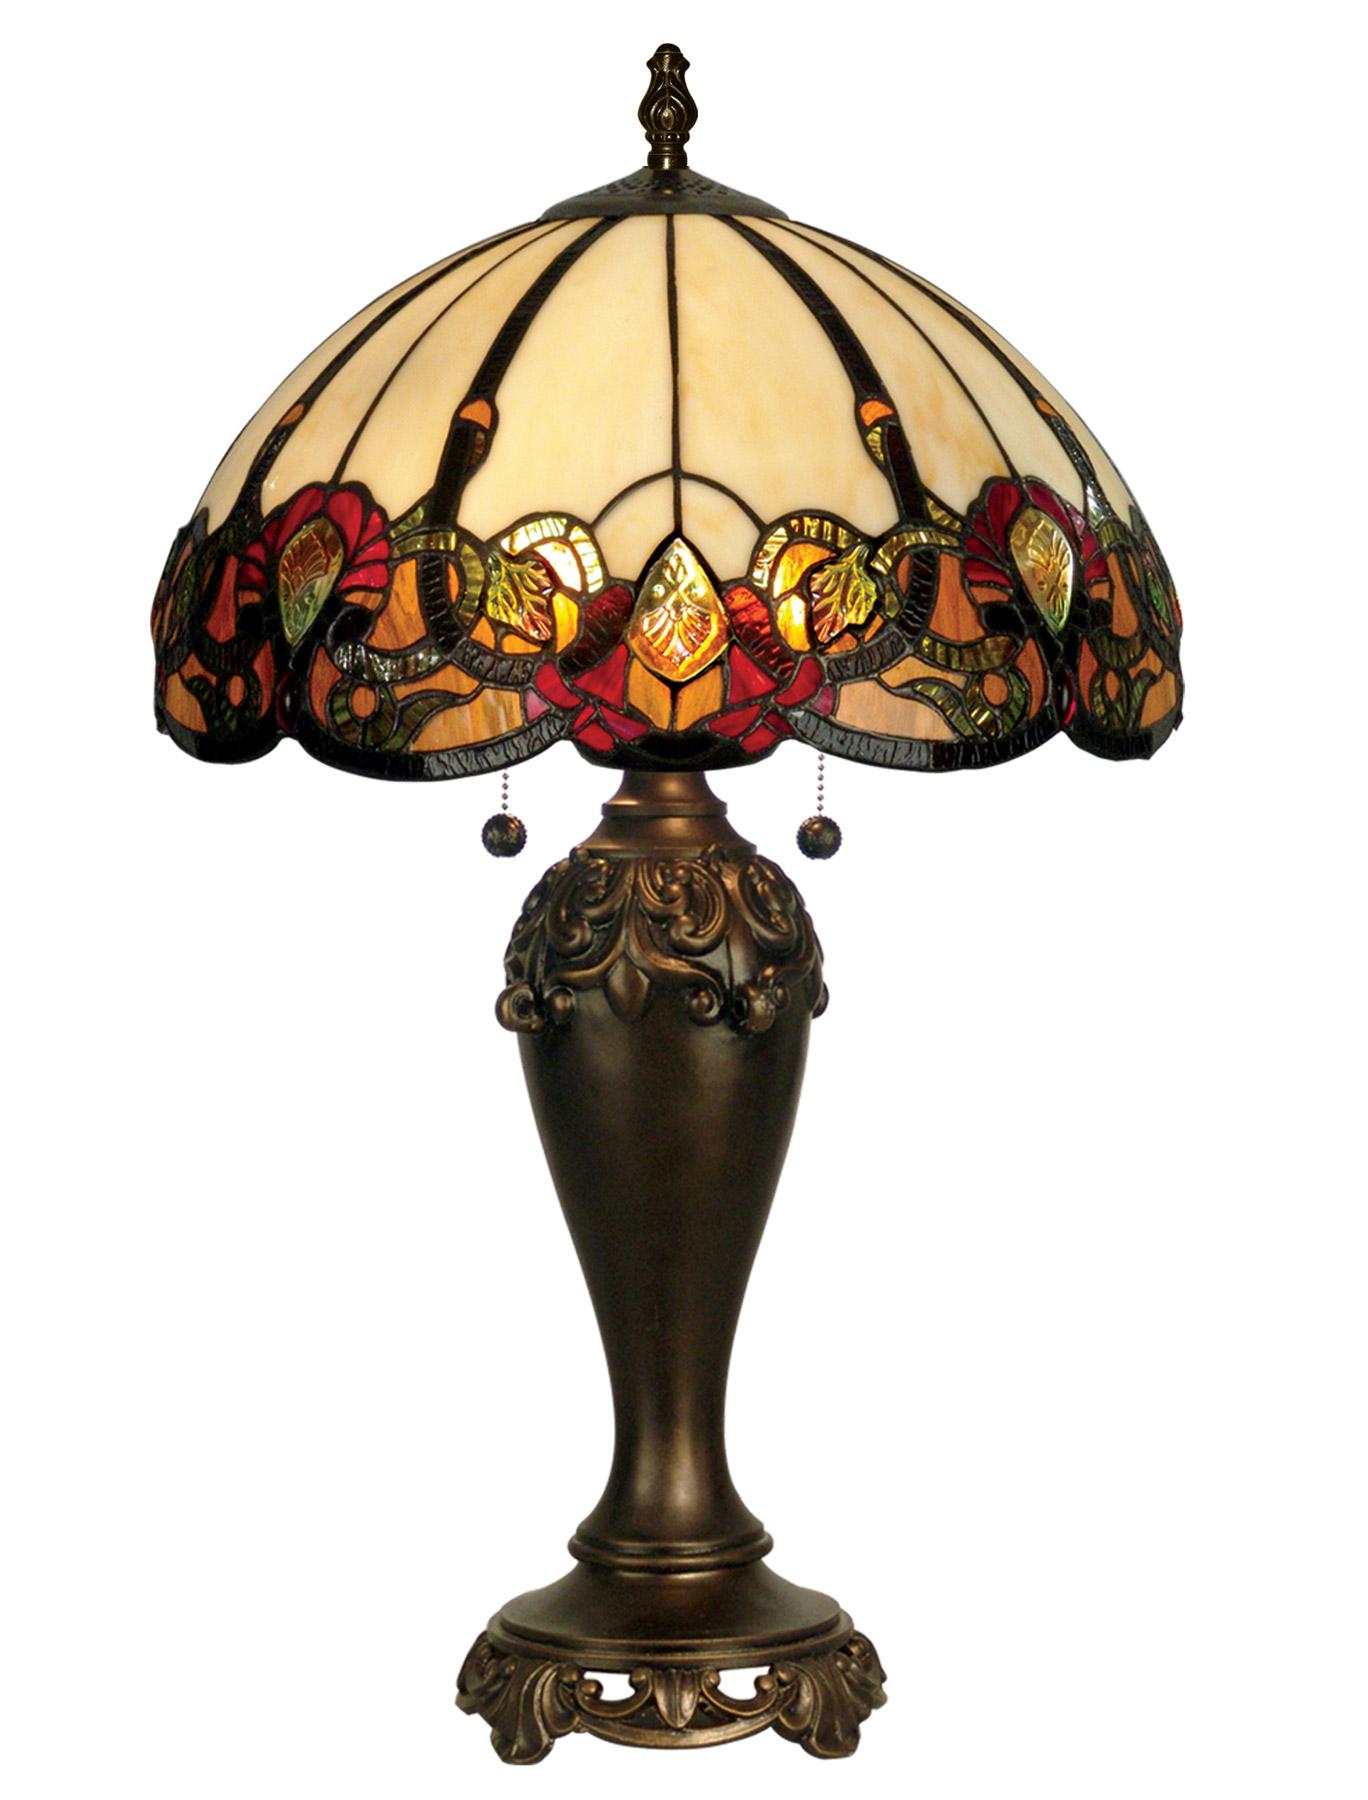 Dale Tiffany TT90235 Tiffany Northlake Table Lamp